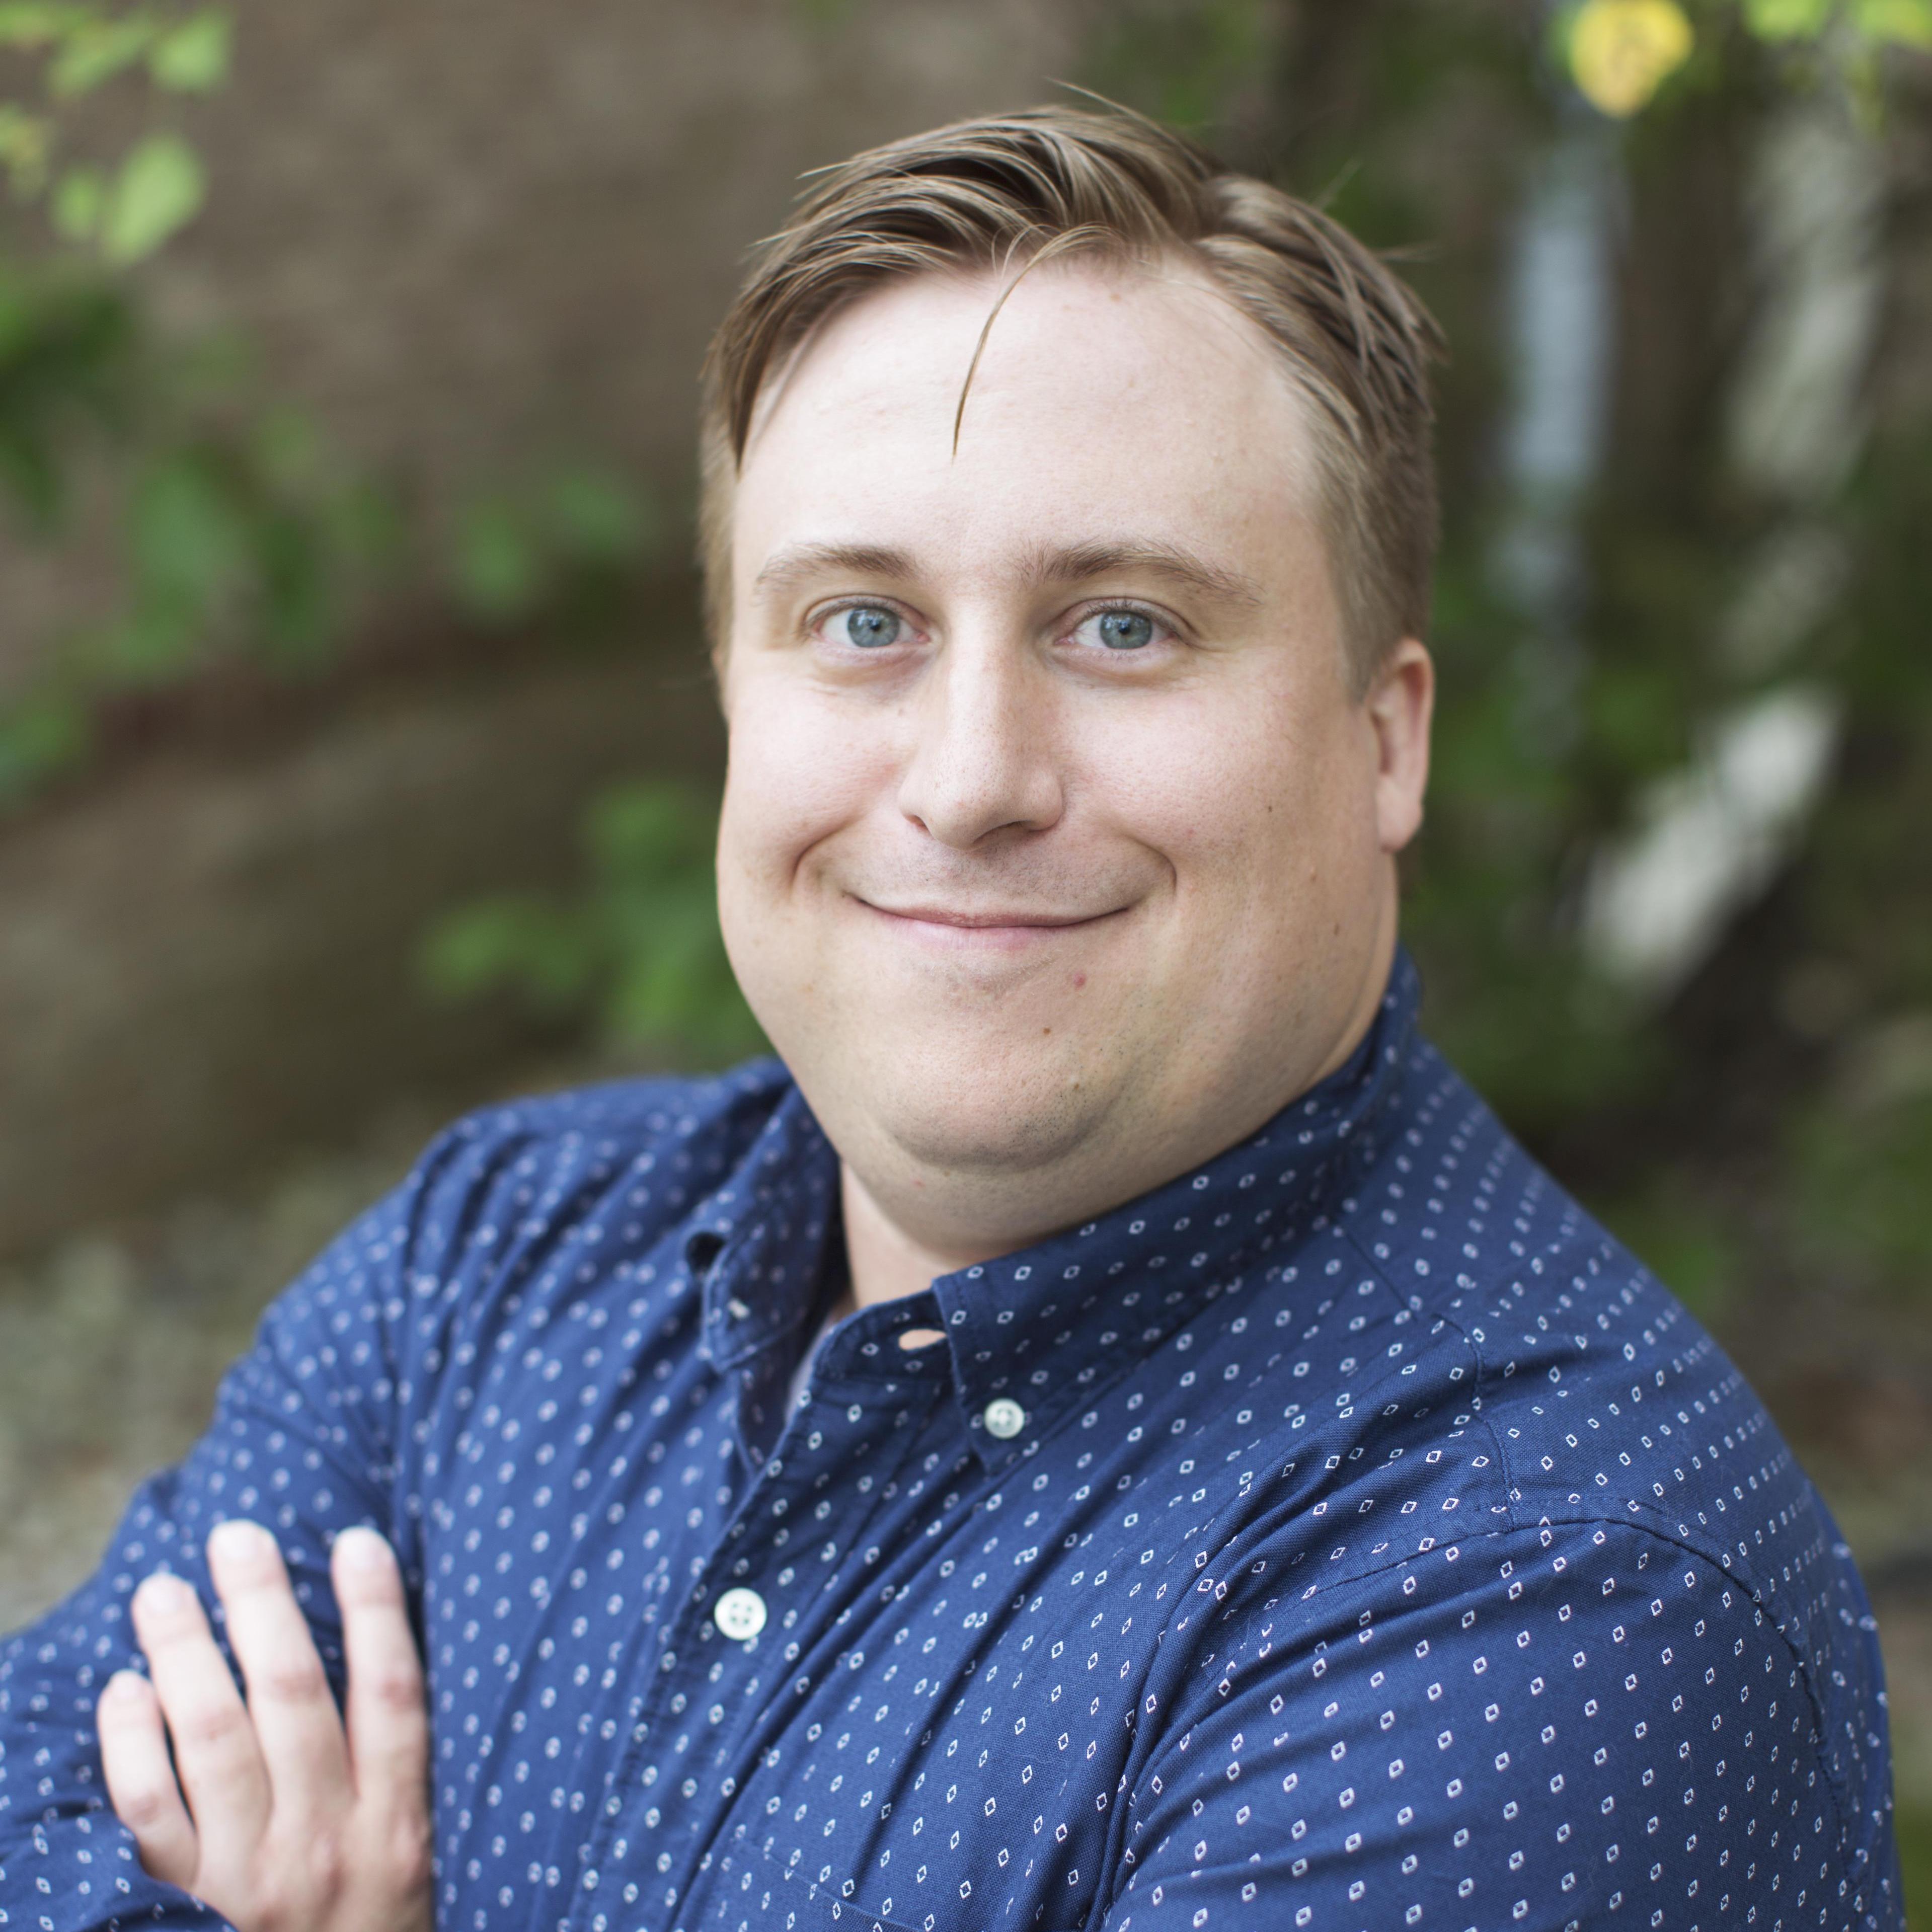 Joe Lieberman's Profile Photo